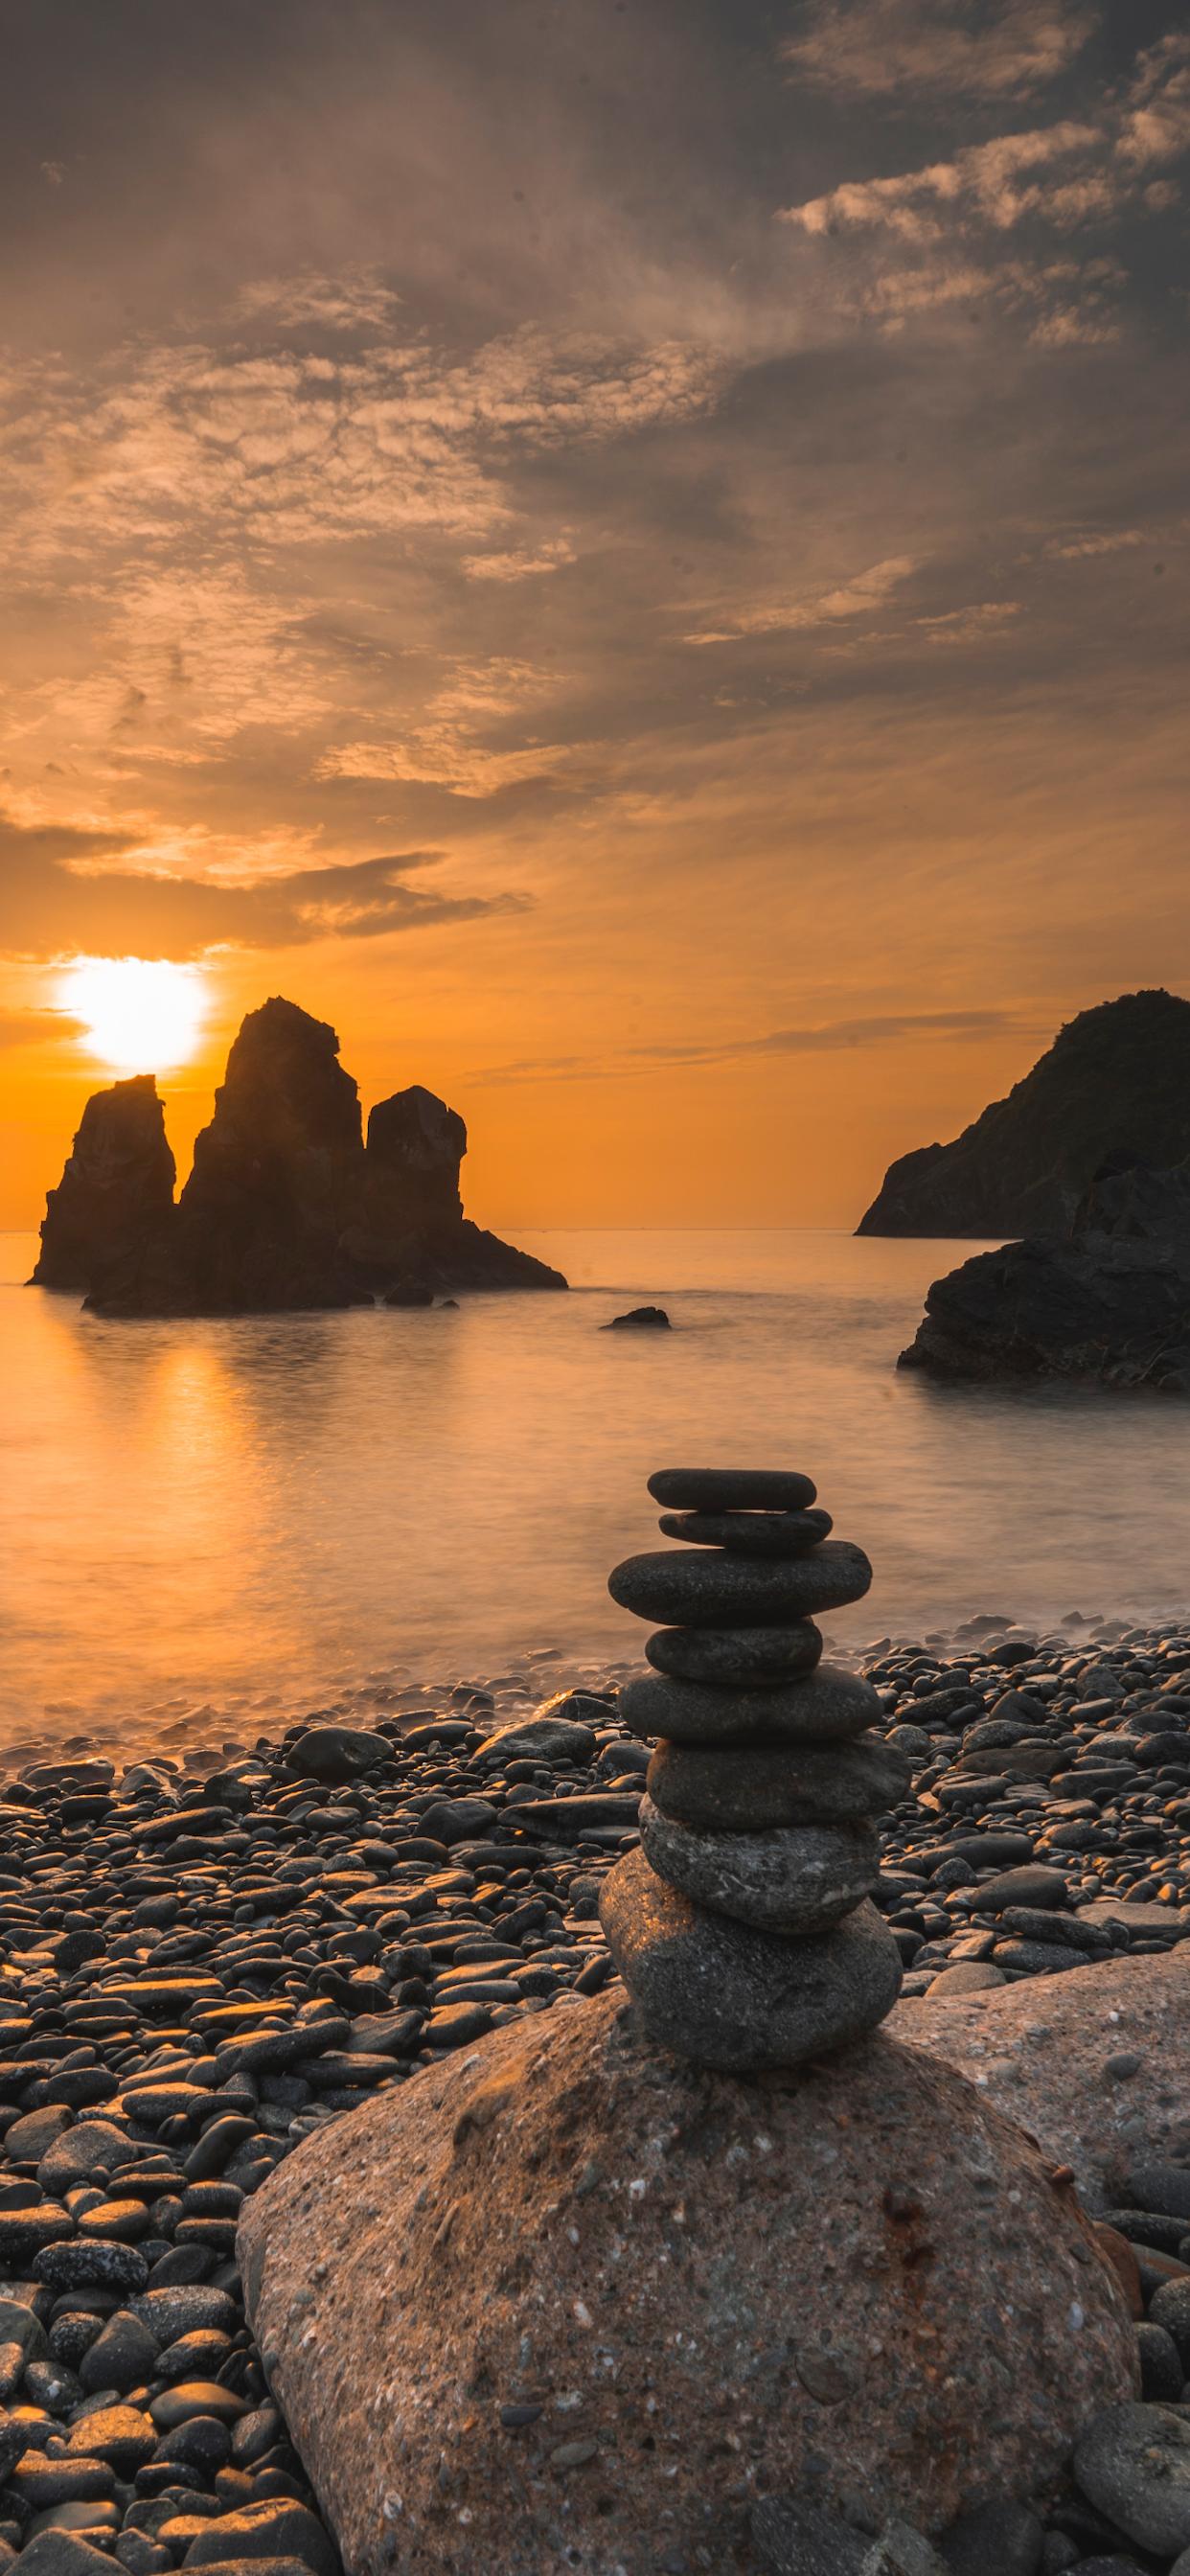 iPhone wallpapers stones ocean sunset Fonds d'écran iPhone du 11/10/2019